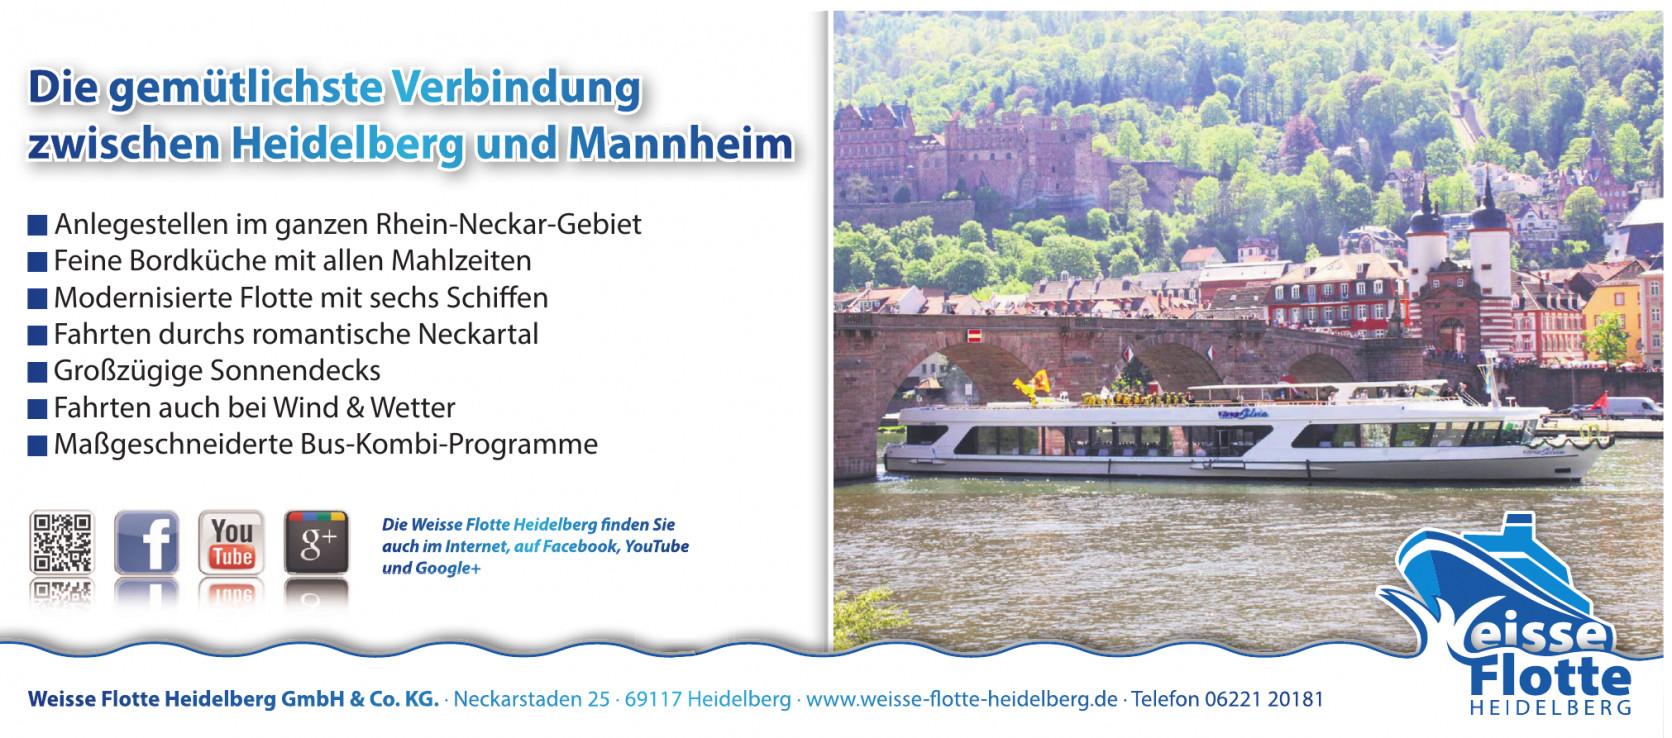 Weisse Flotte Heidelberg GmbH & Co. KG